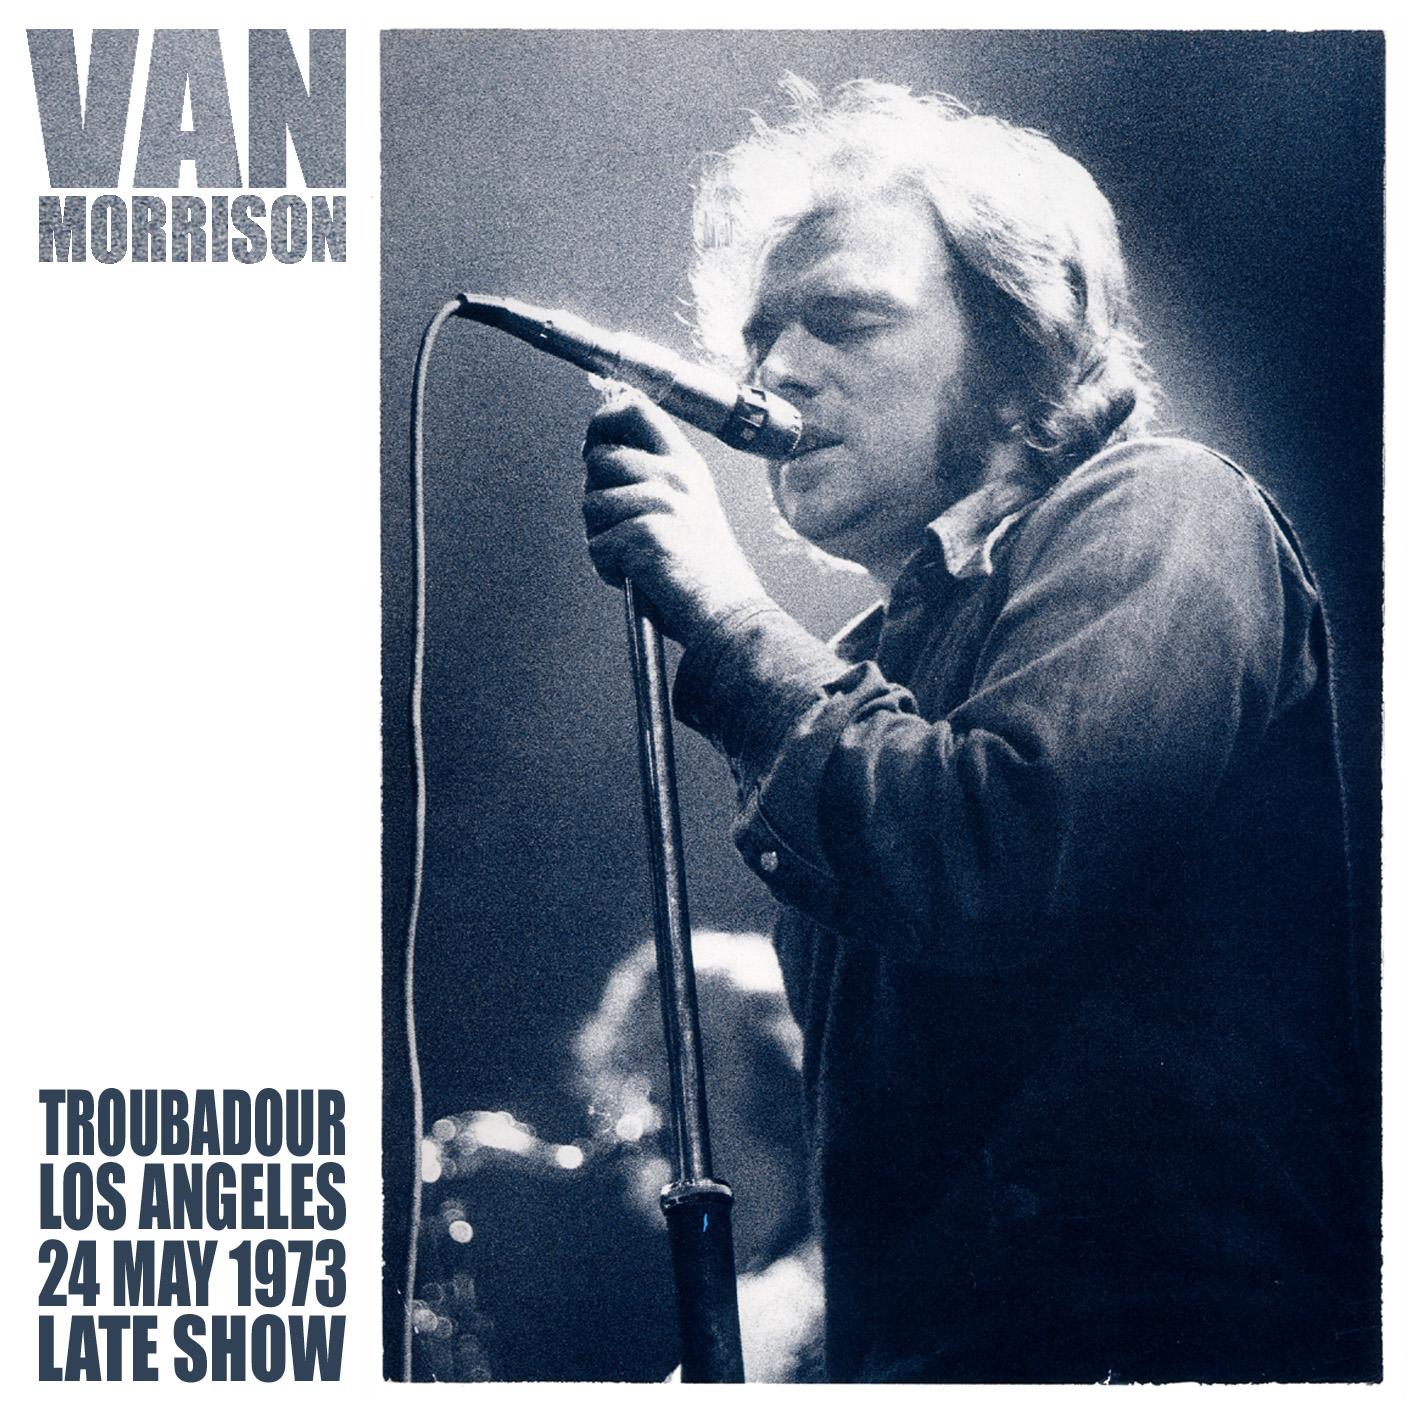 VanMorrison1973-05-24LateTheTroubadourLosAngelesCA.jpg